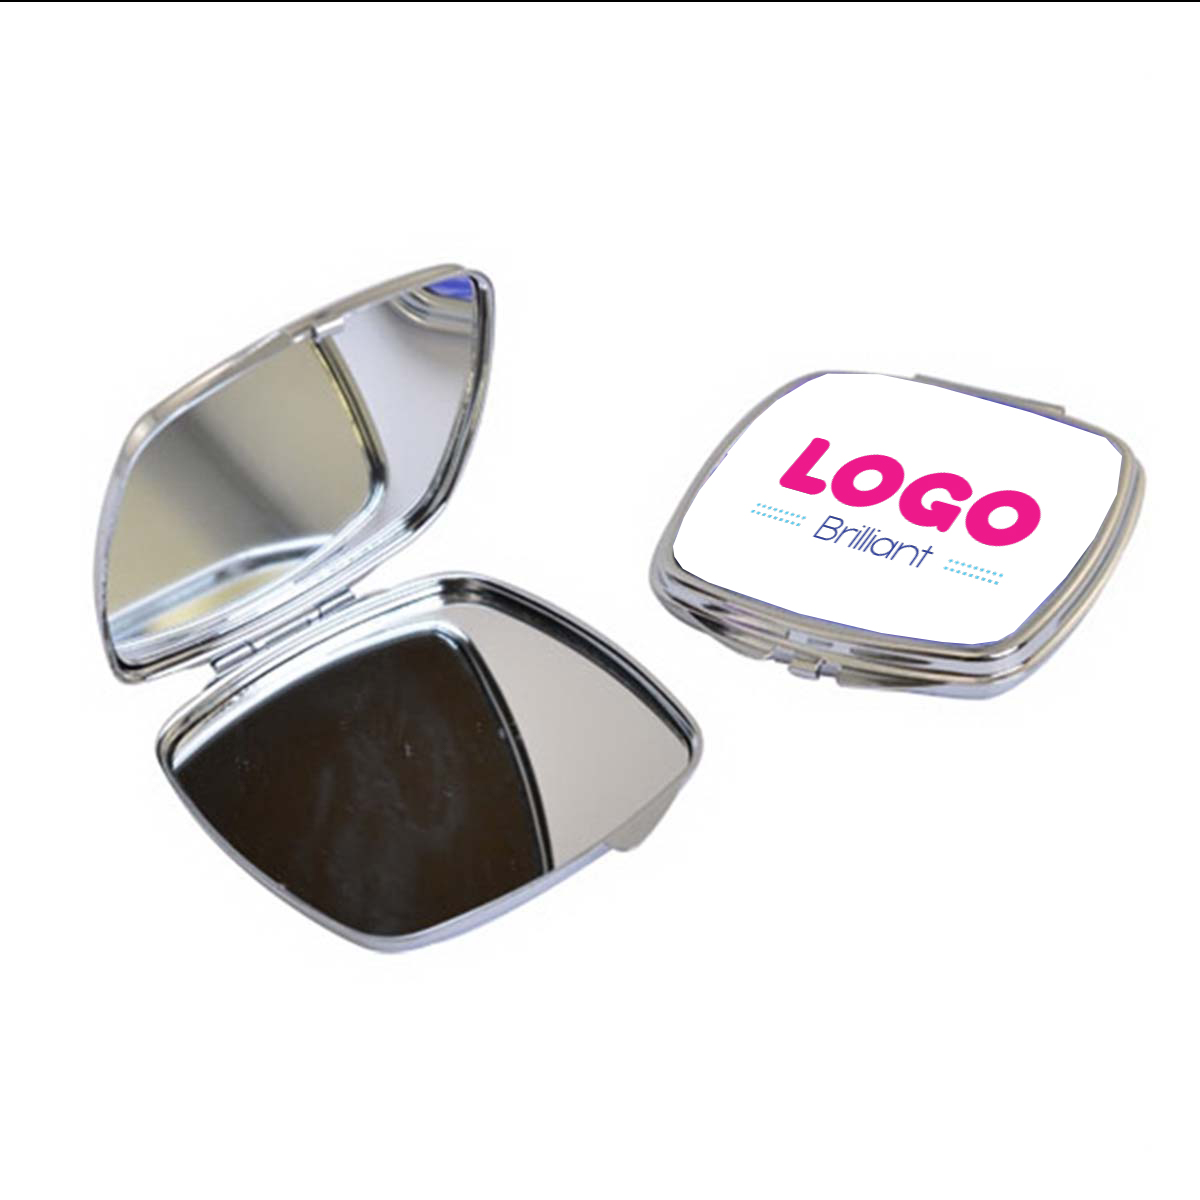 134847 square compact mirror full color imprint